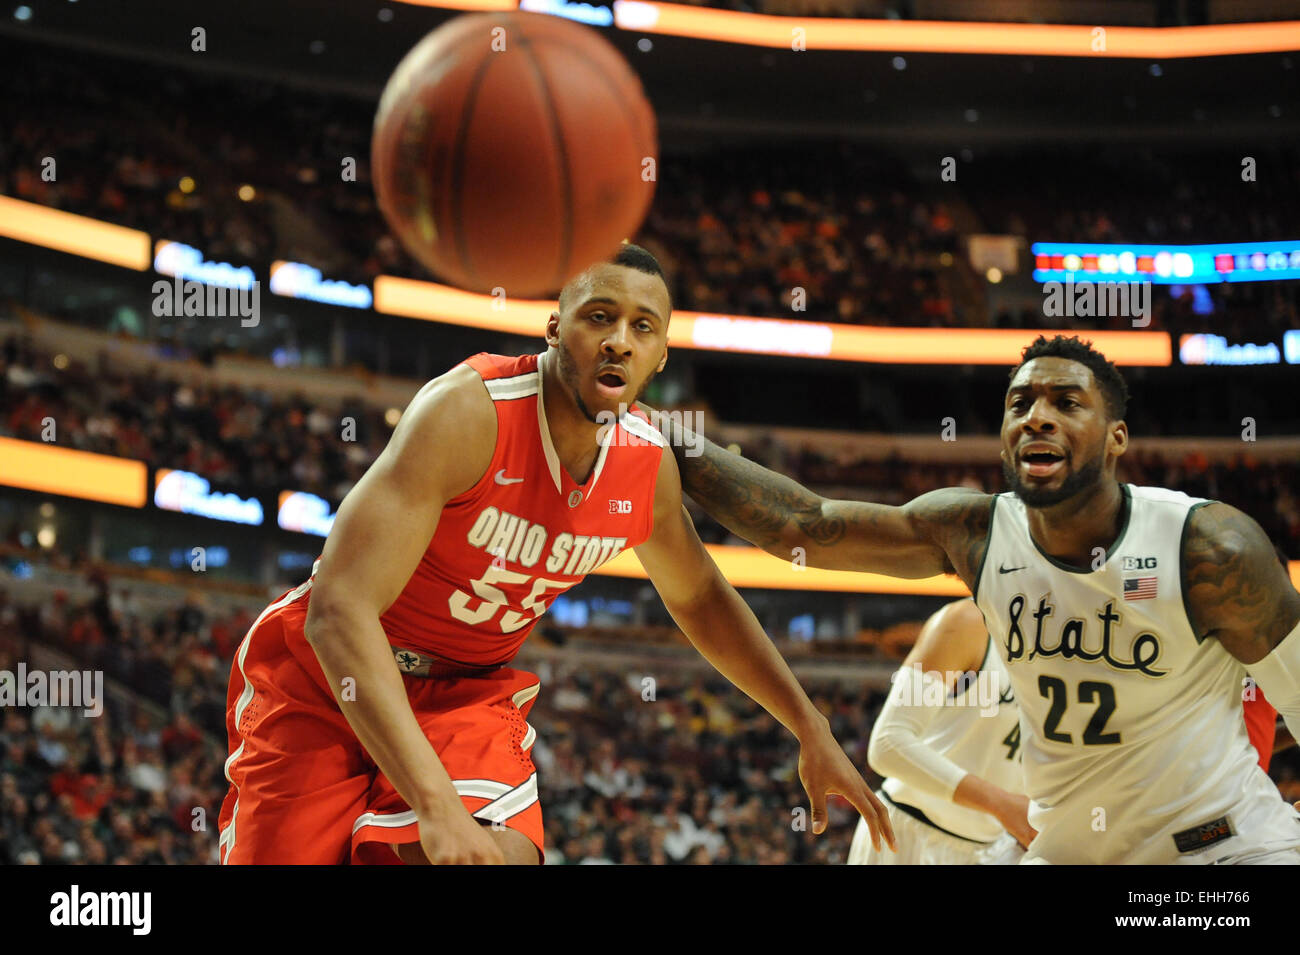 Ohio State Basketball Court 2015